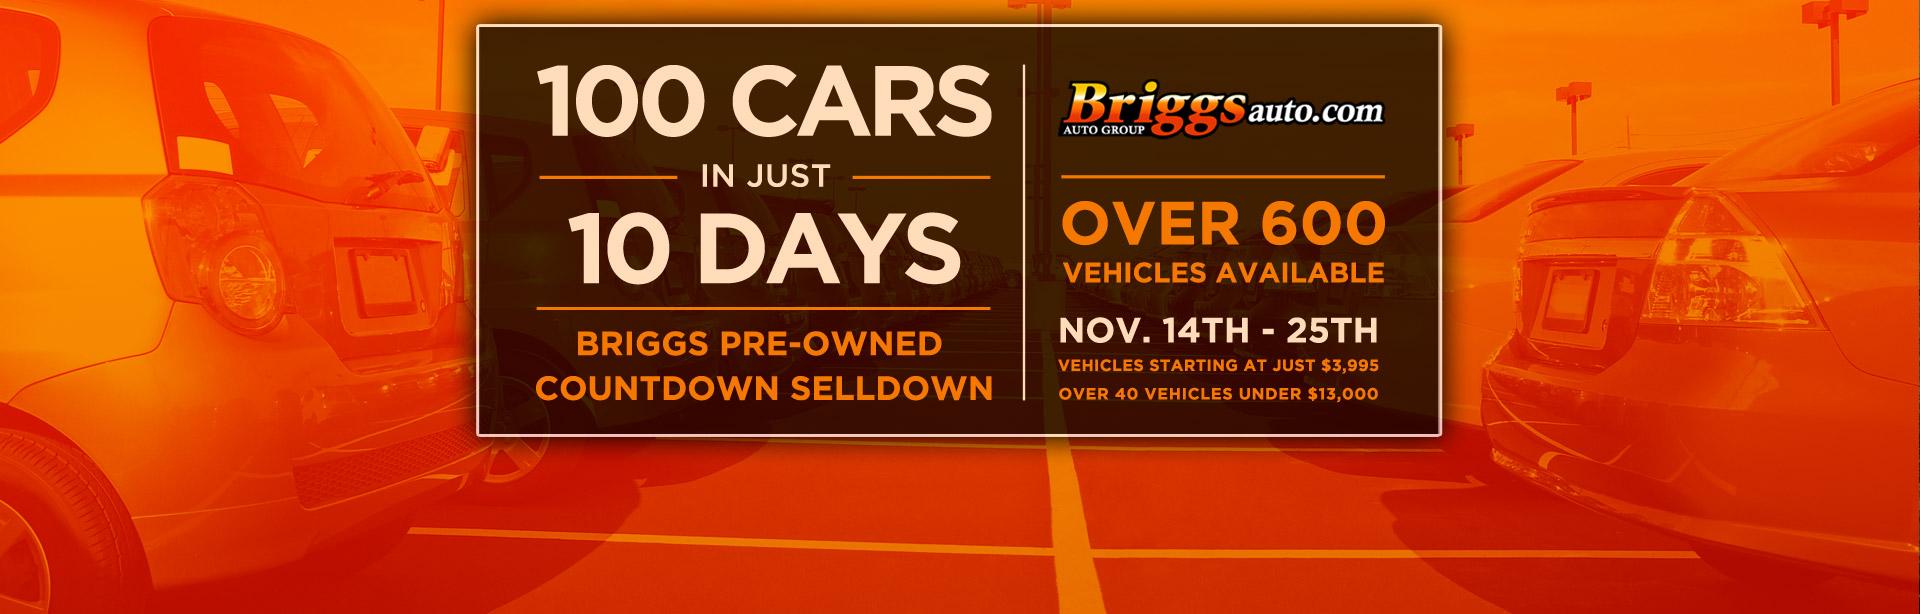 100 Cars 10 Days